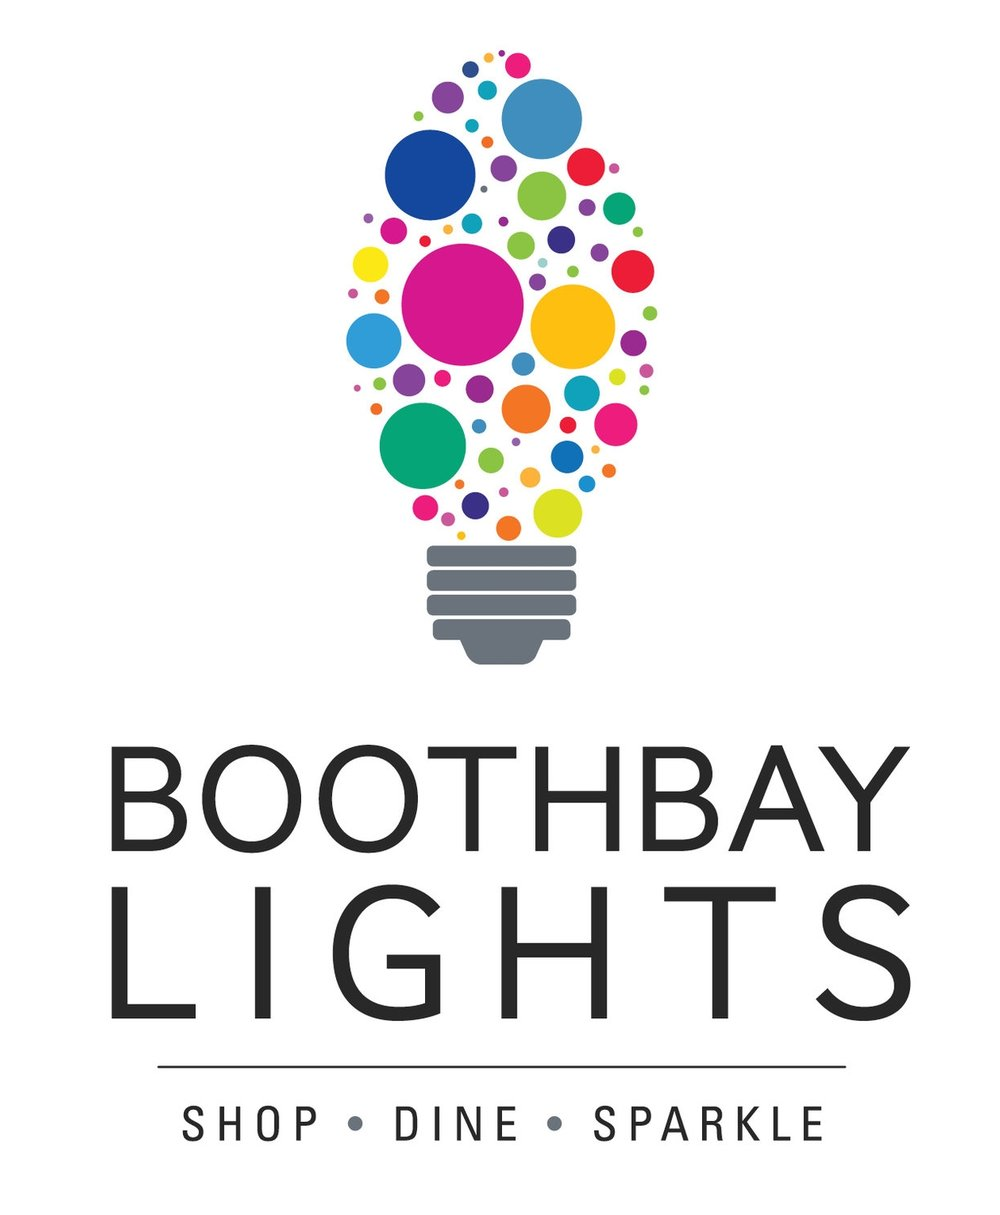 BBY_001_2018_Boothbay_Lights_ID_4C_Tag.jpg